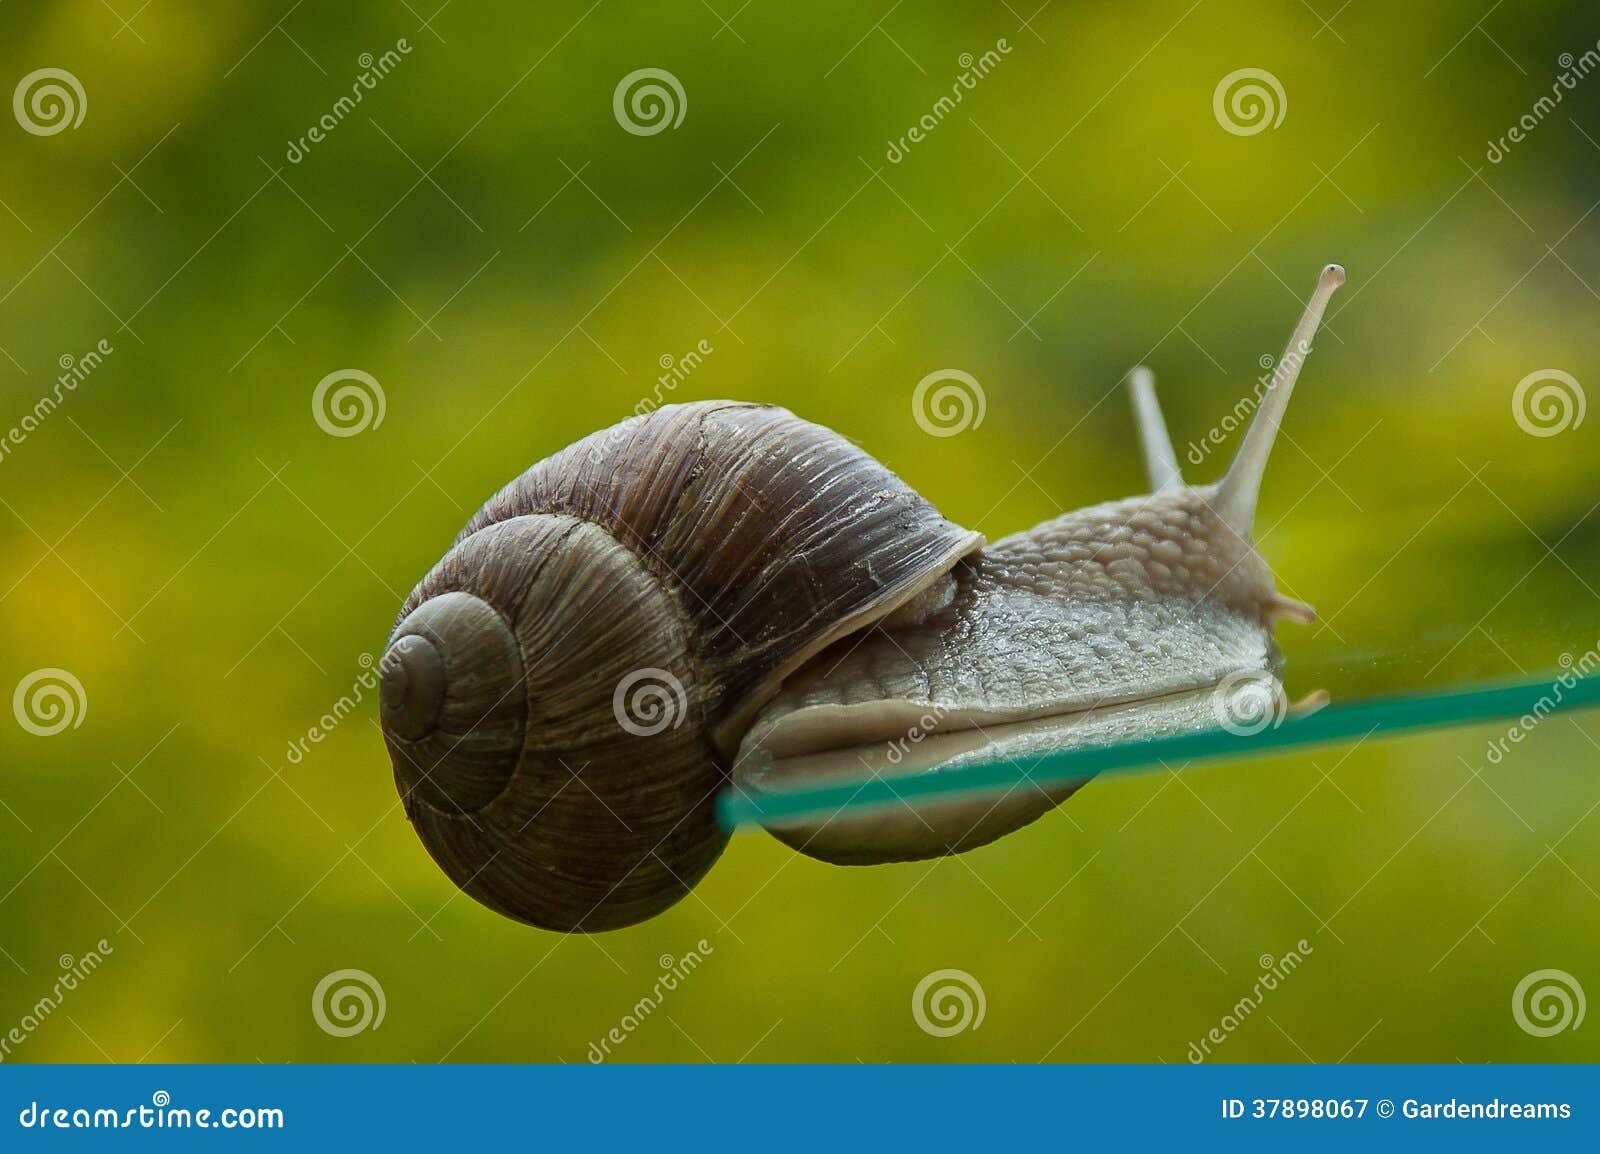 Curieusement escargot